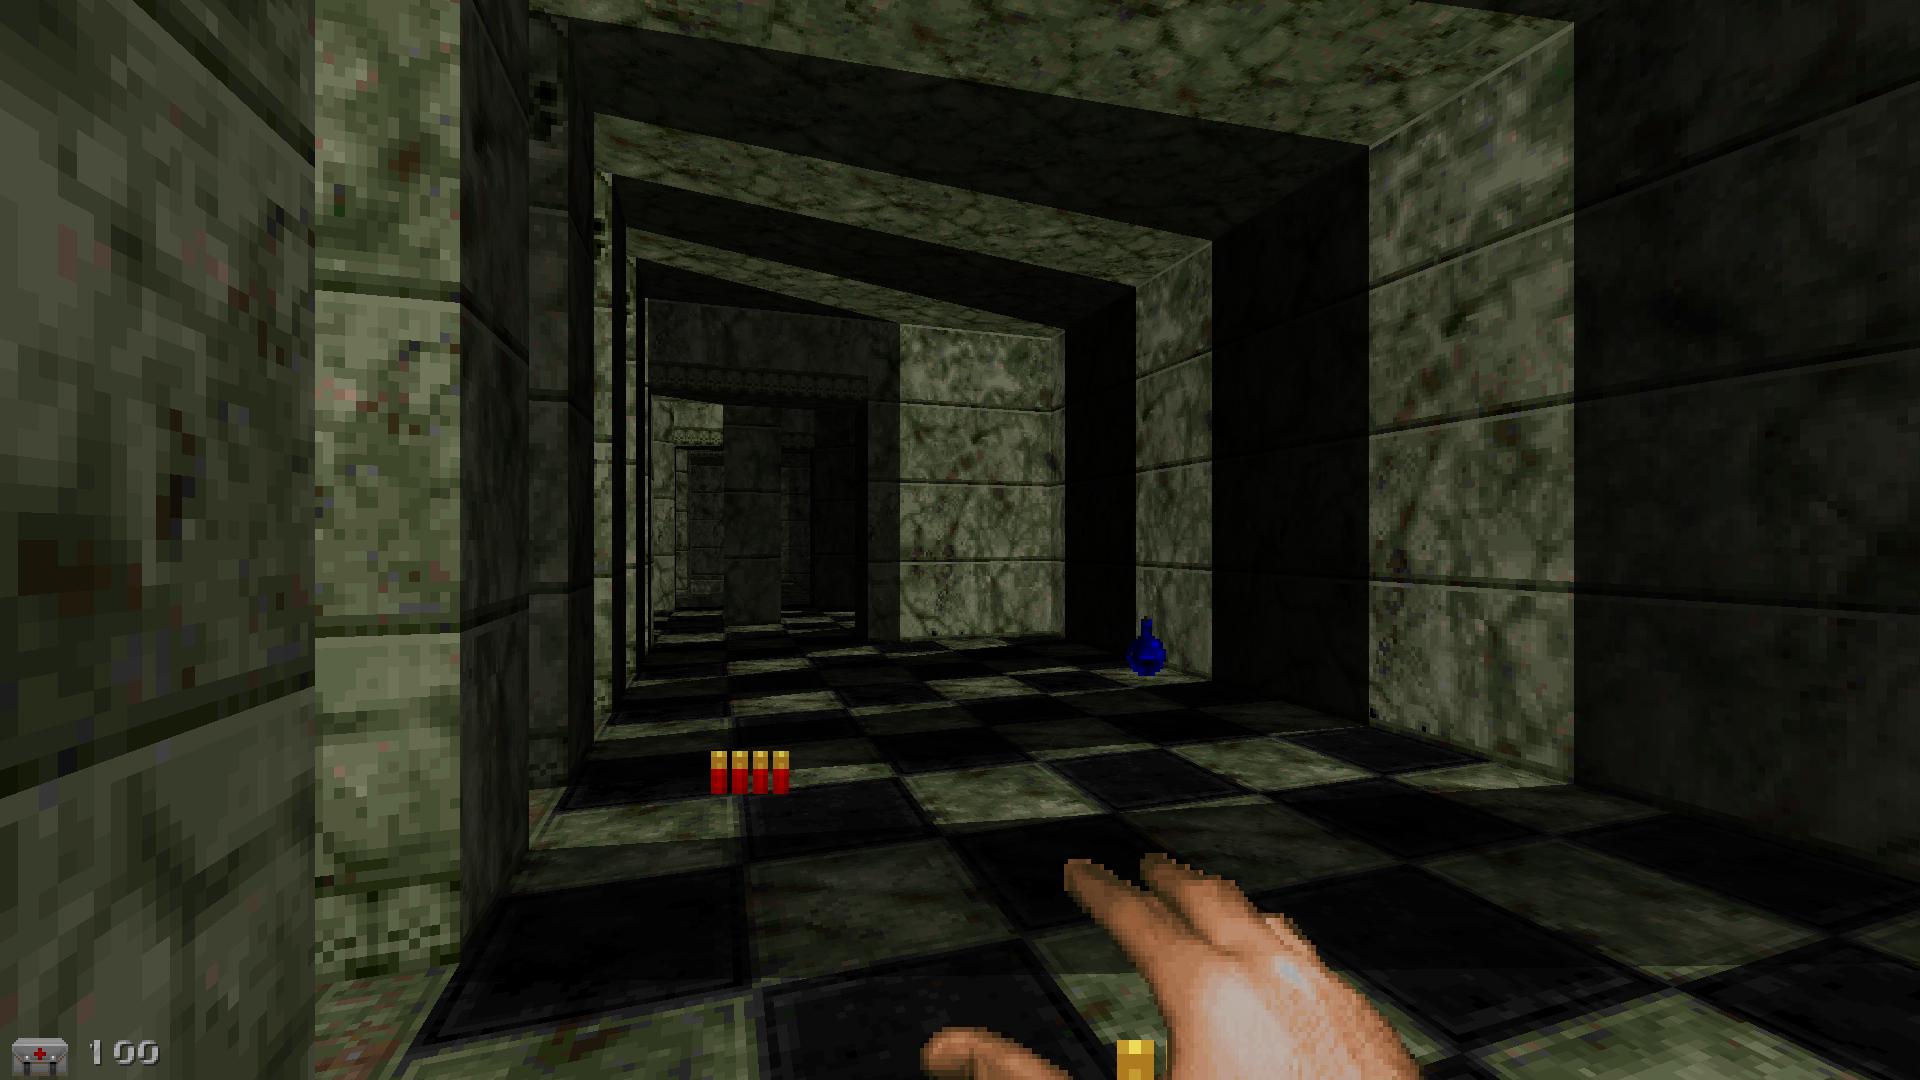 Screenshot_Doom_20210424_175942.png.3f46516fdc1a0293b6be61c26bd36480.png